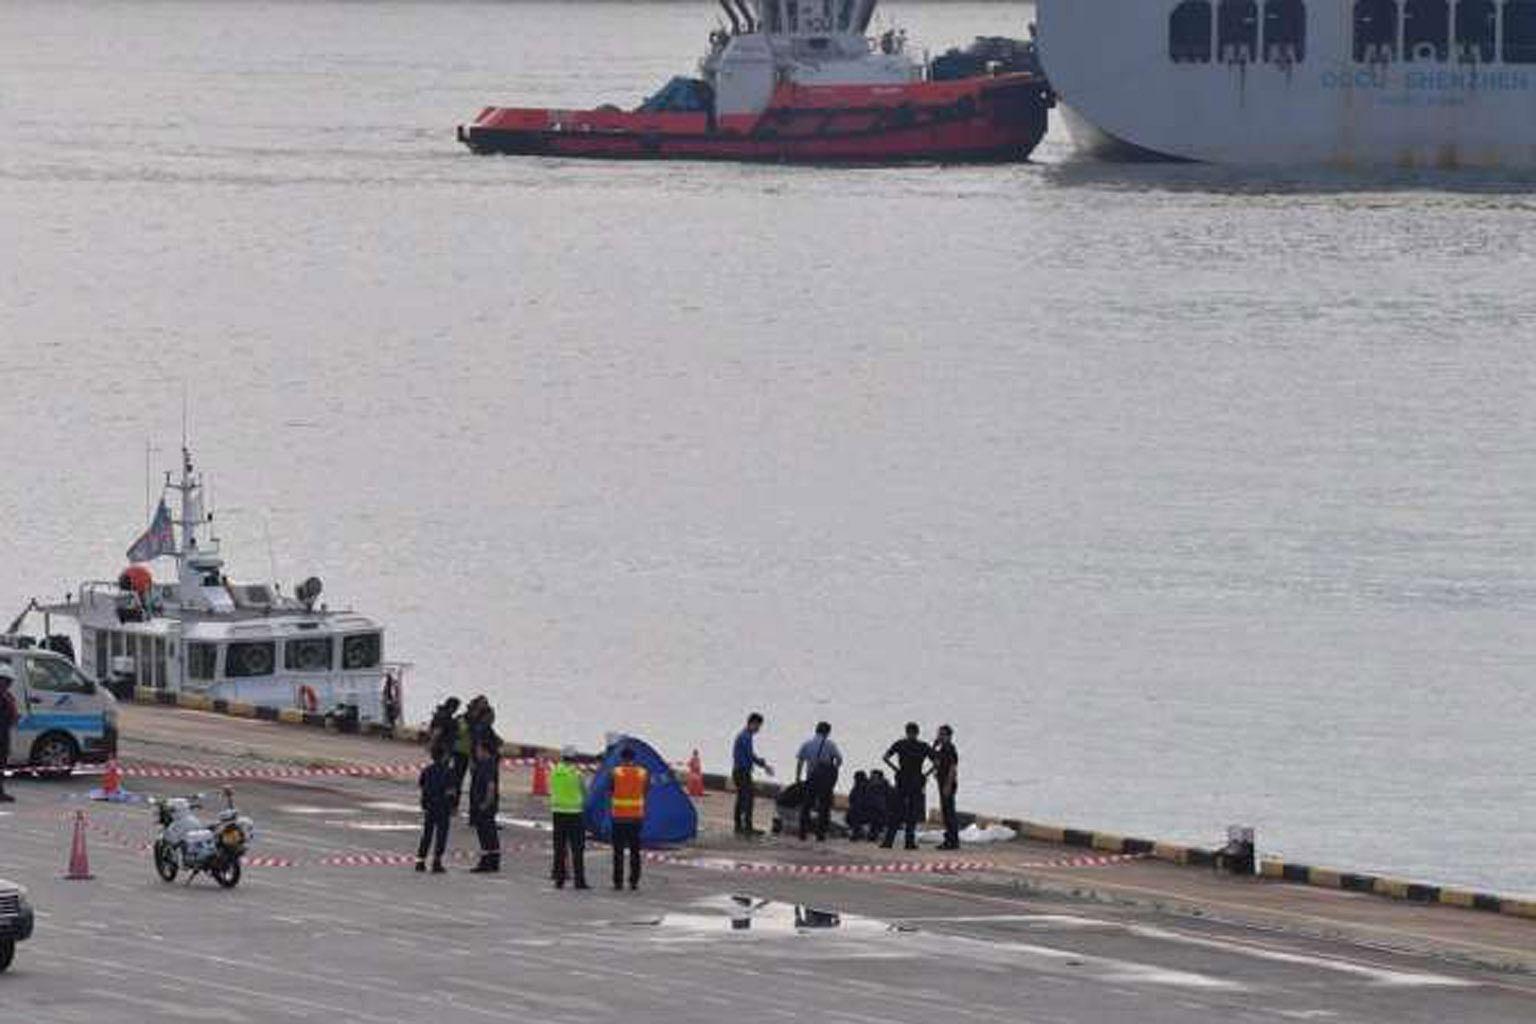 Lelaki 29 tahun ditemui mati di perairan Keppel Terminal